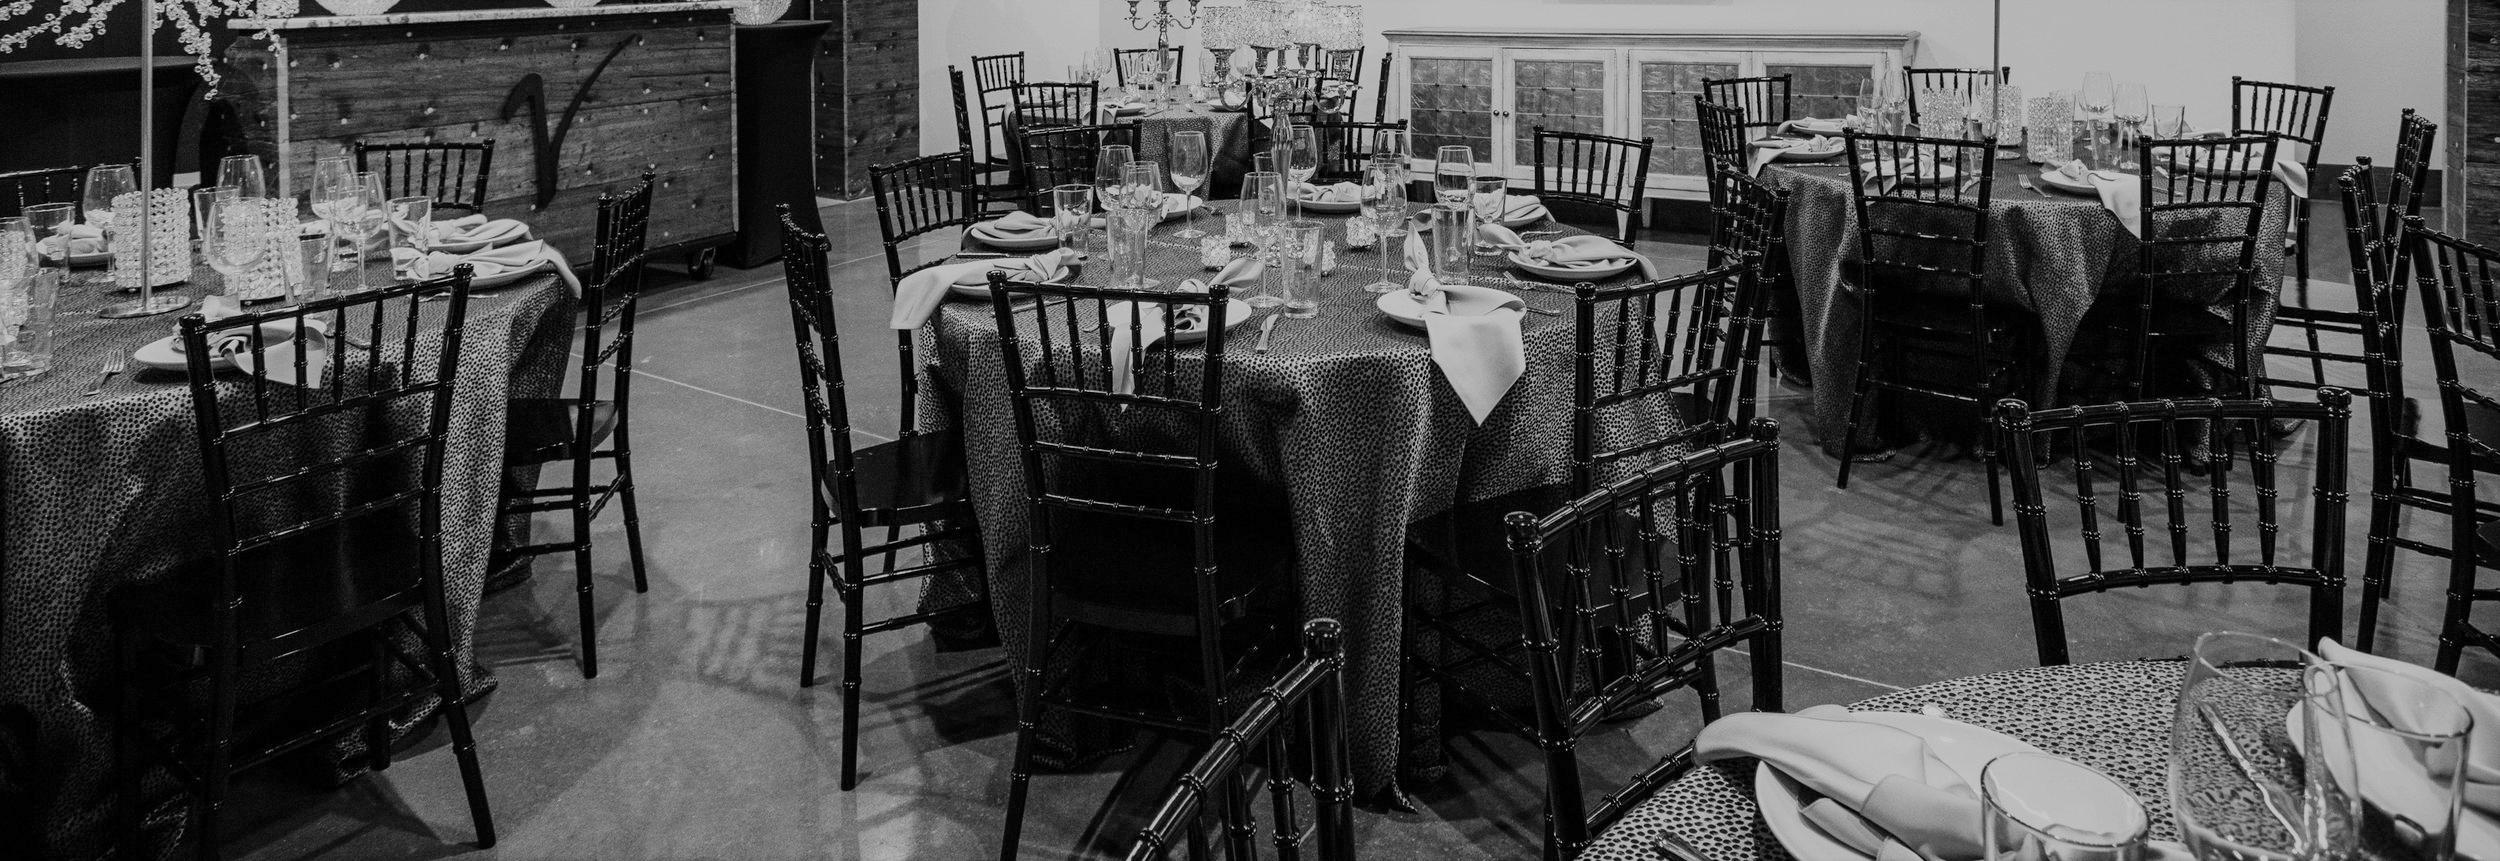 Banquet (2).jpg